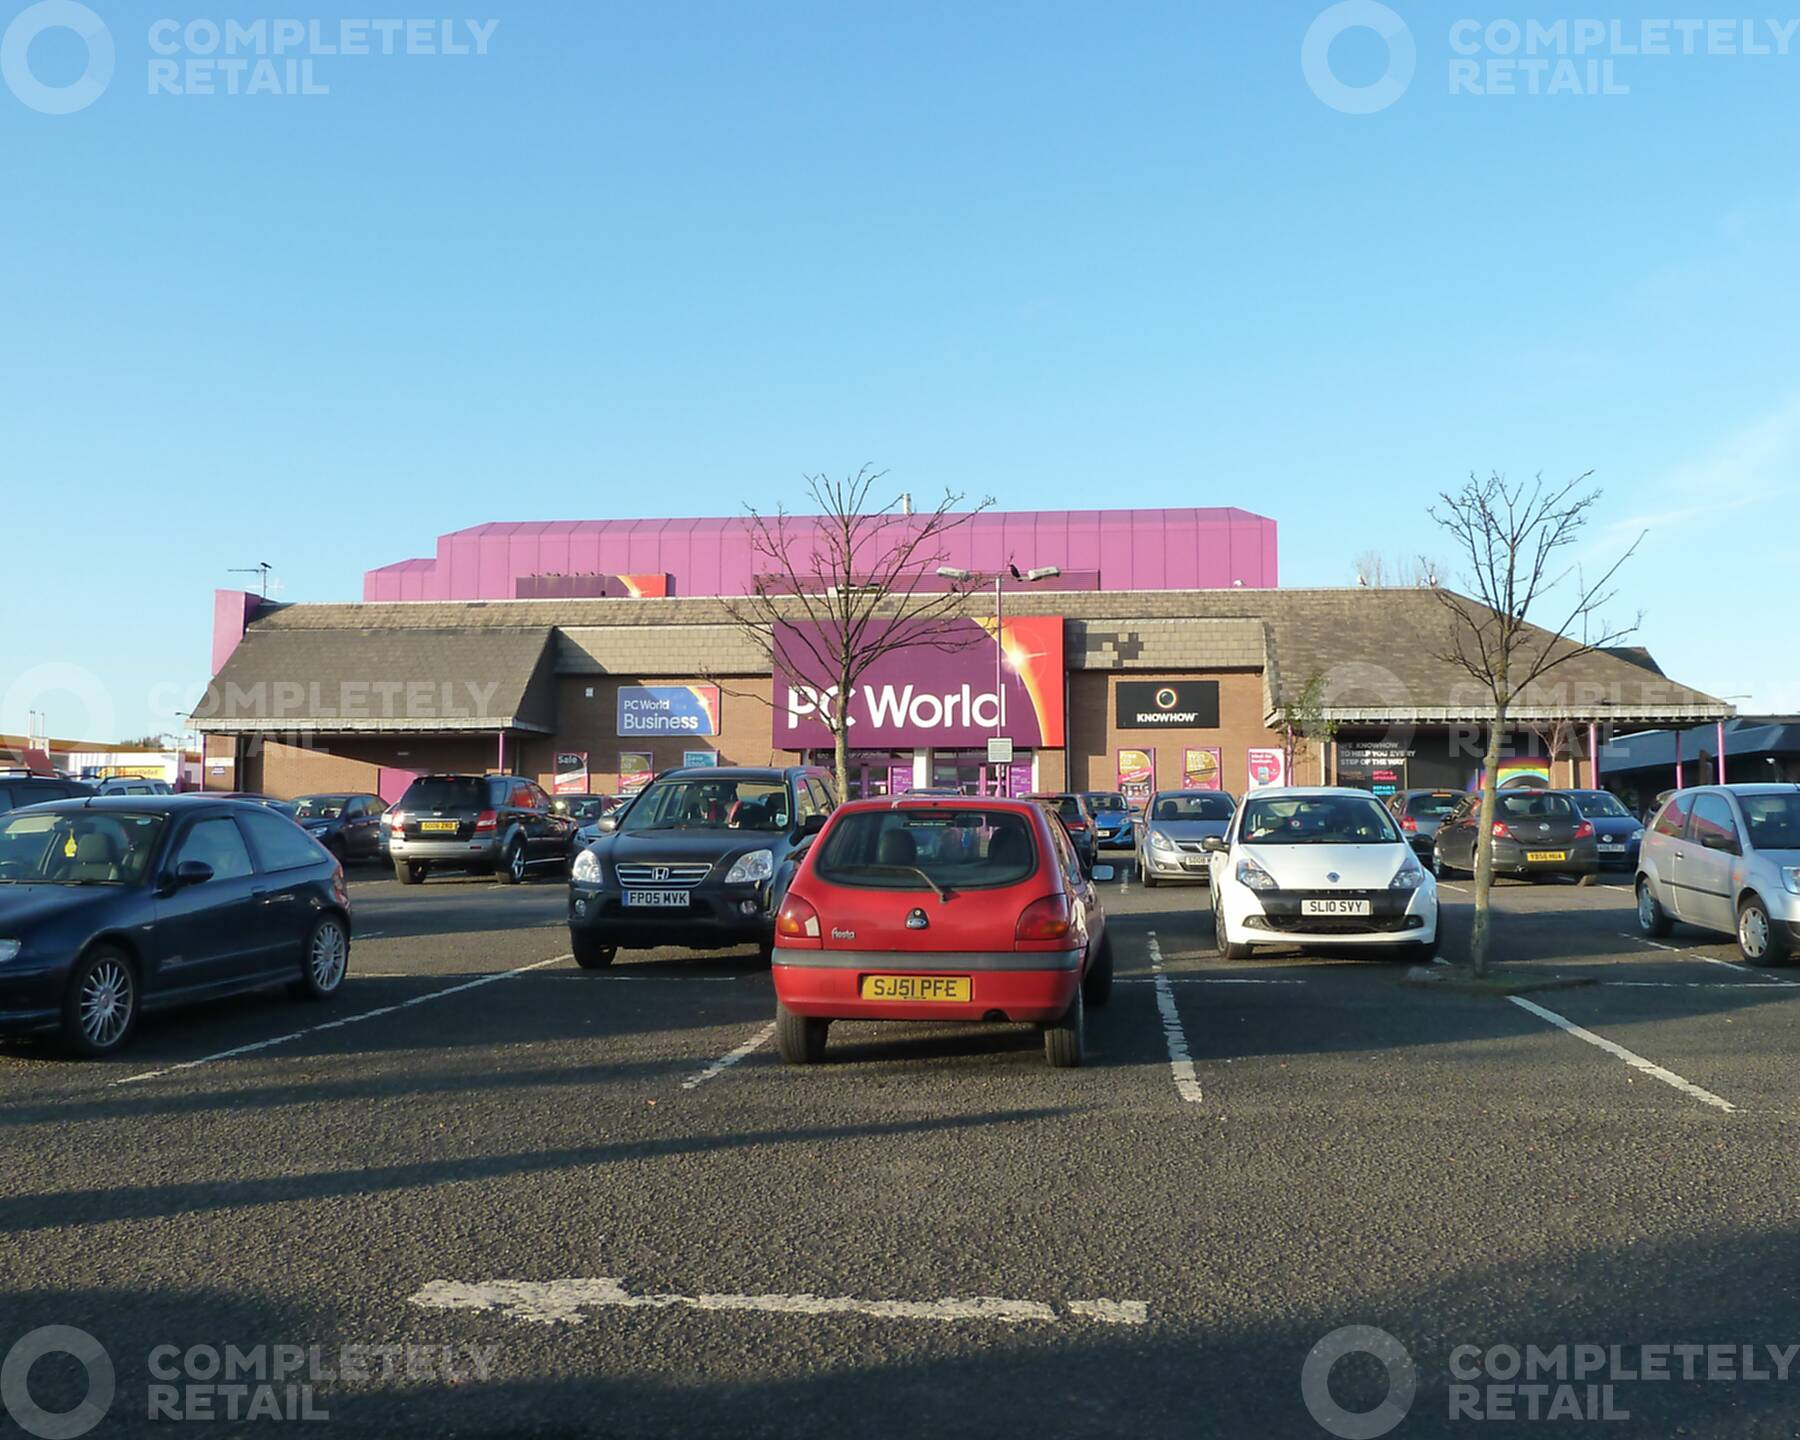 Corstorphine Retail Park